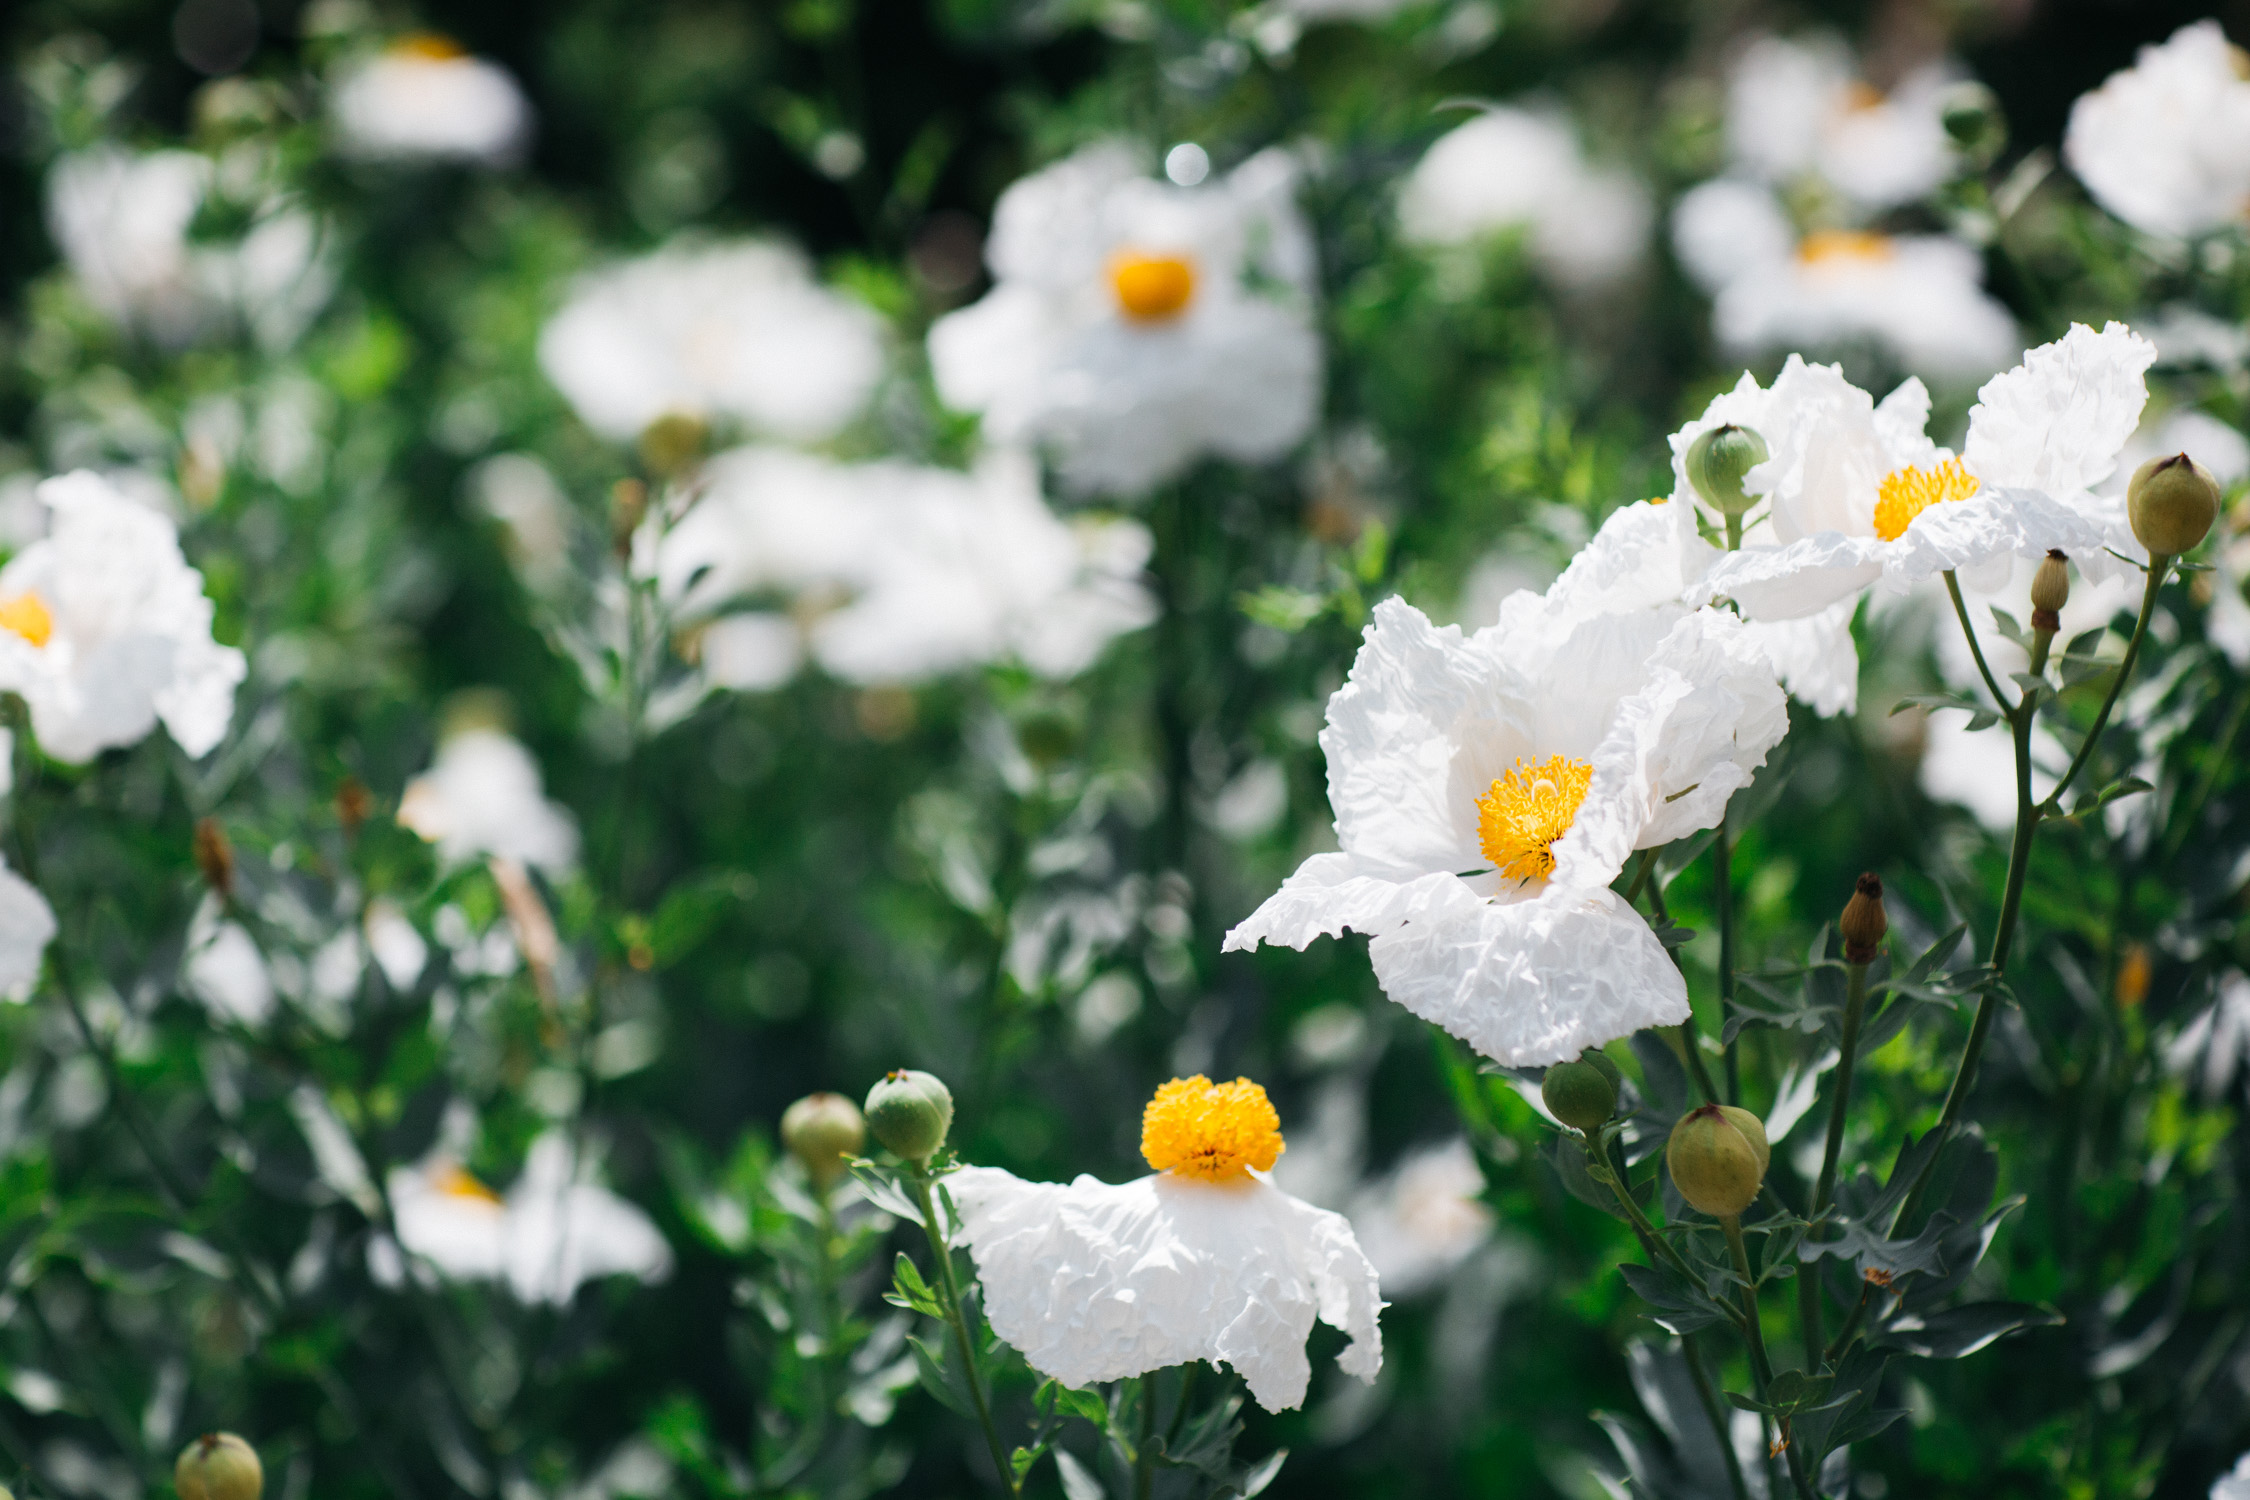 Arboretum-2018-Web-11.jpg